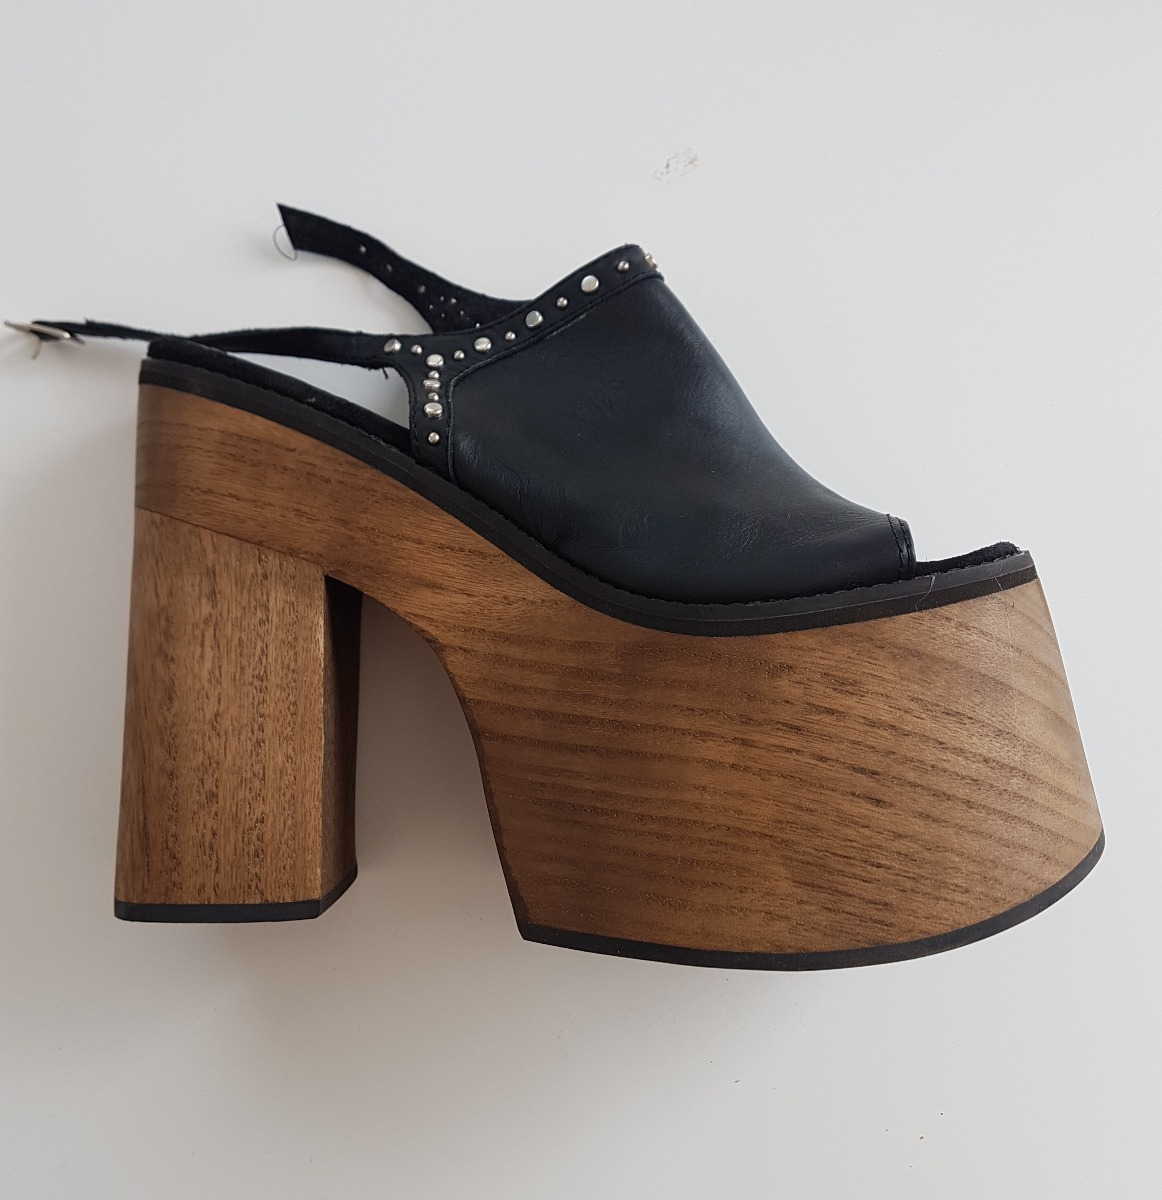 0d0a6f53e94 sandalias zapato cuero plataforma de madera mujer talle 40. Cargando zoom.